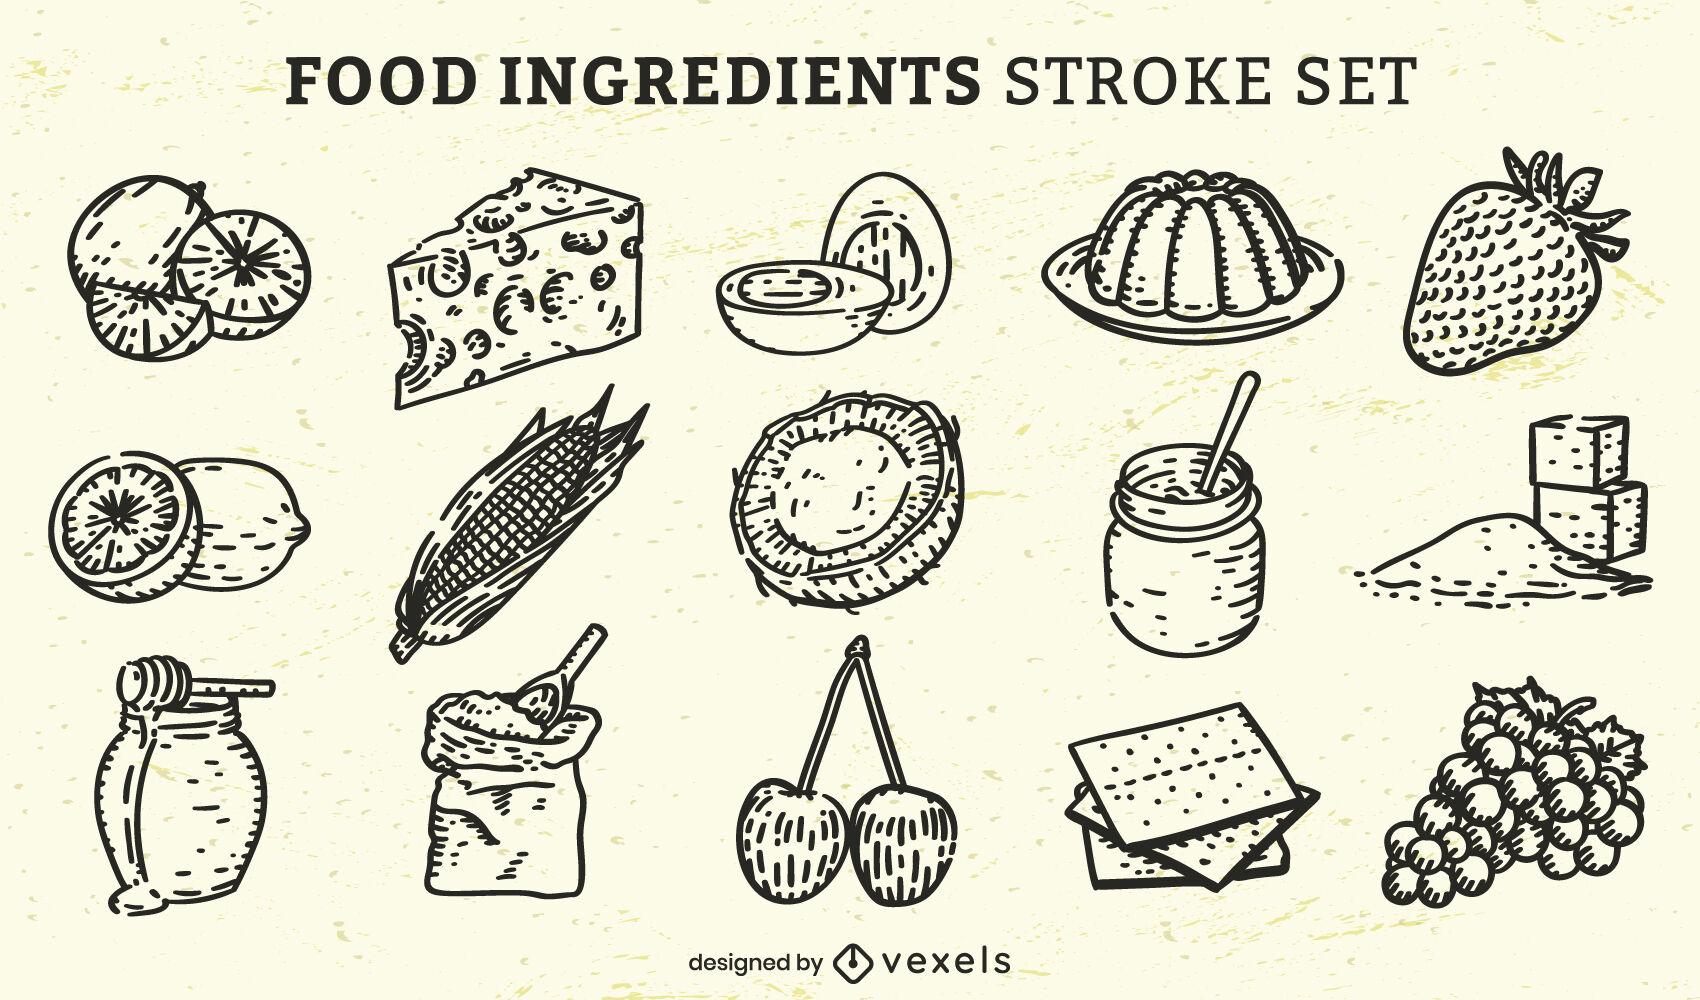 Conjunto de elementos e ingredientes alimentarios dibujados a mano